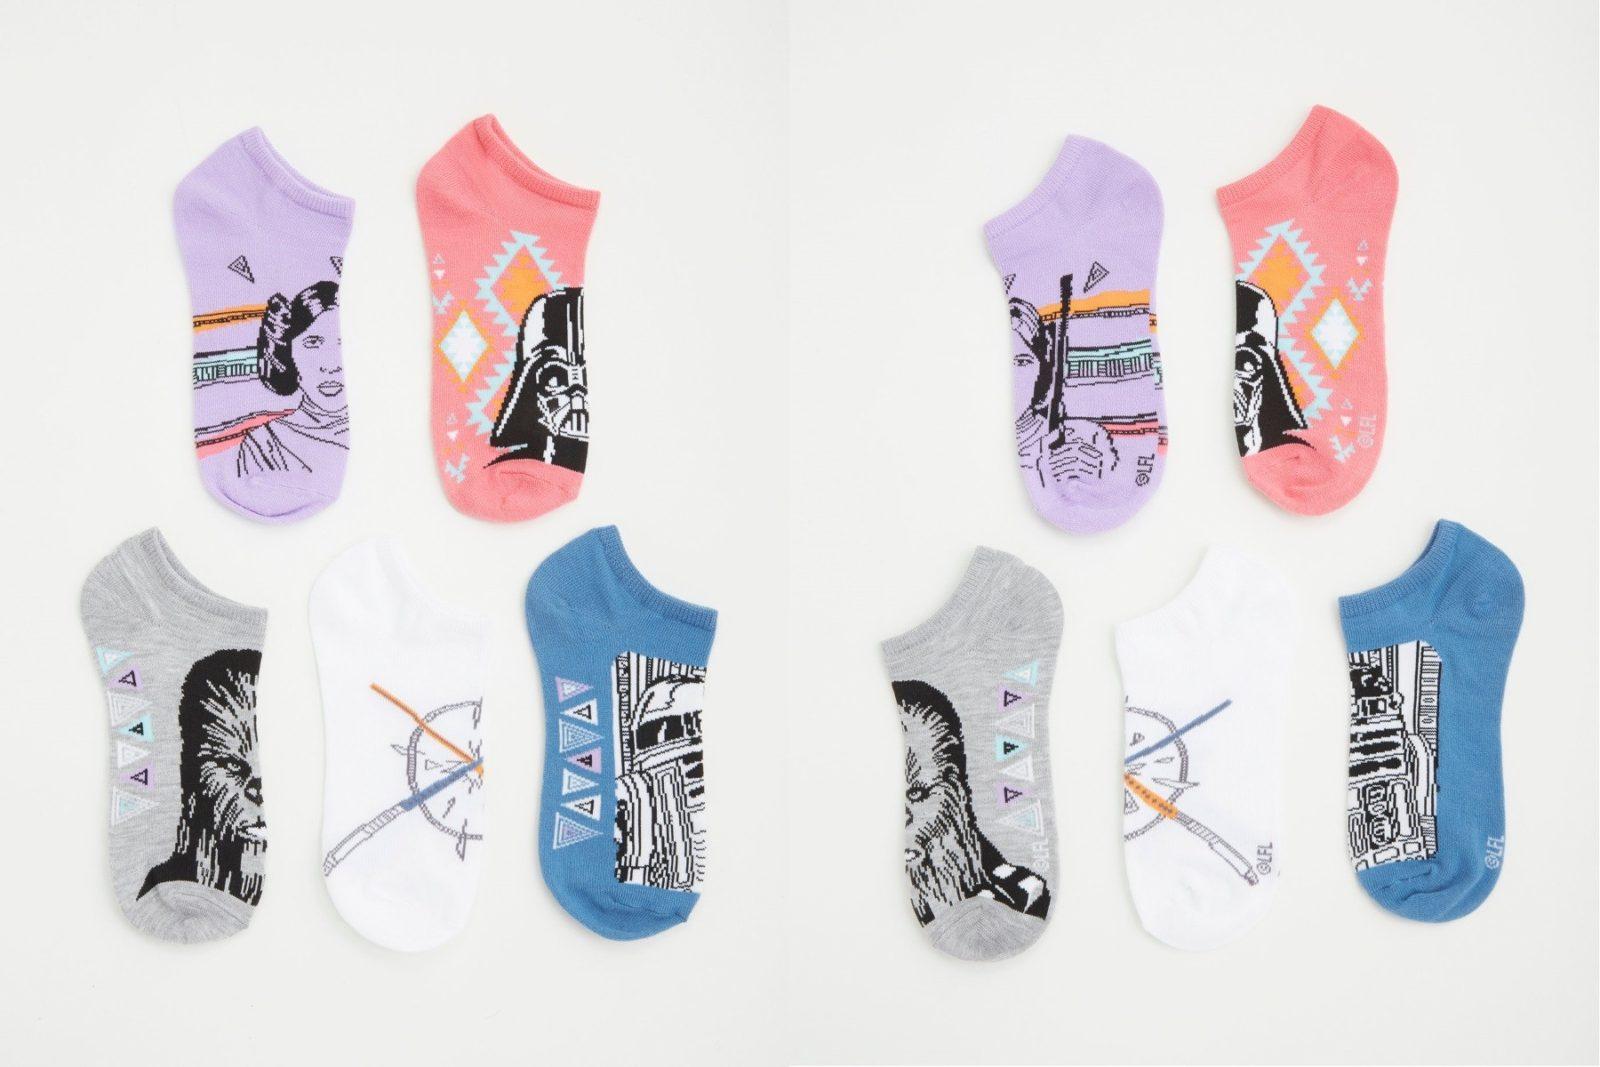 New Star Wars ankle sock pack at Torrid